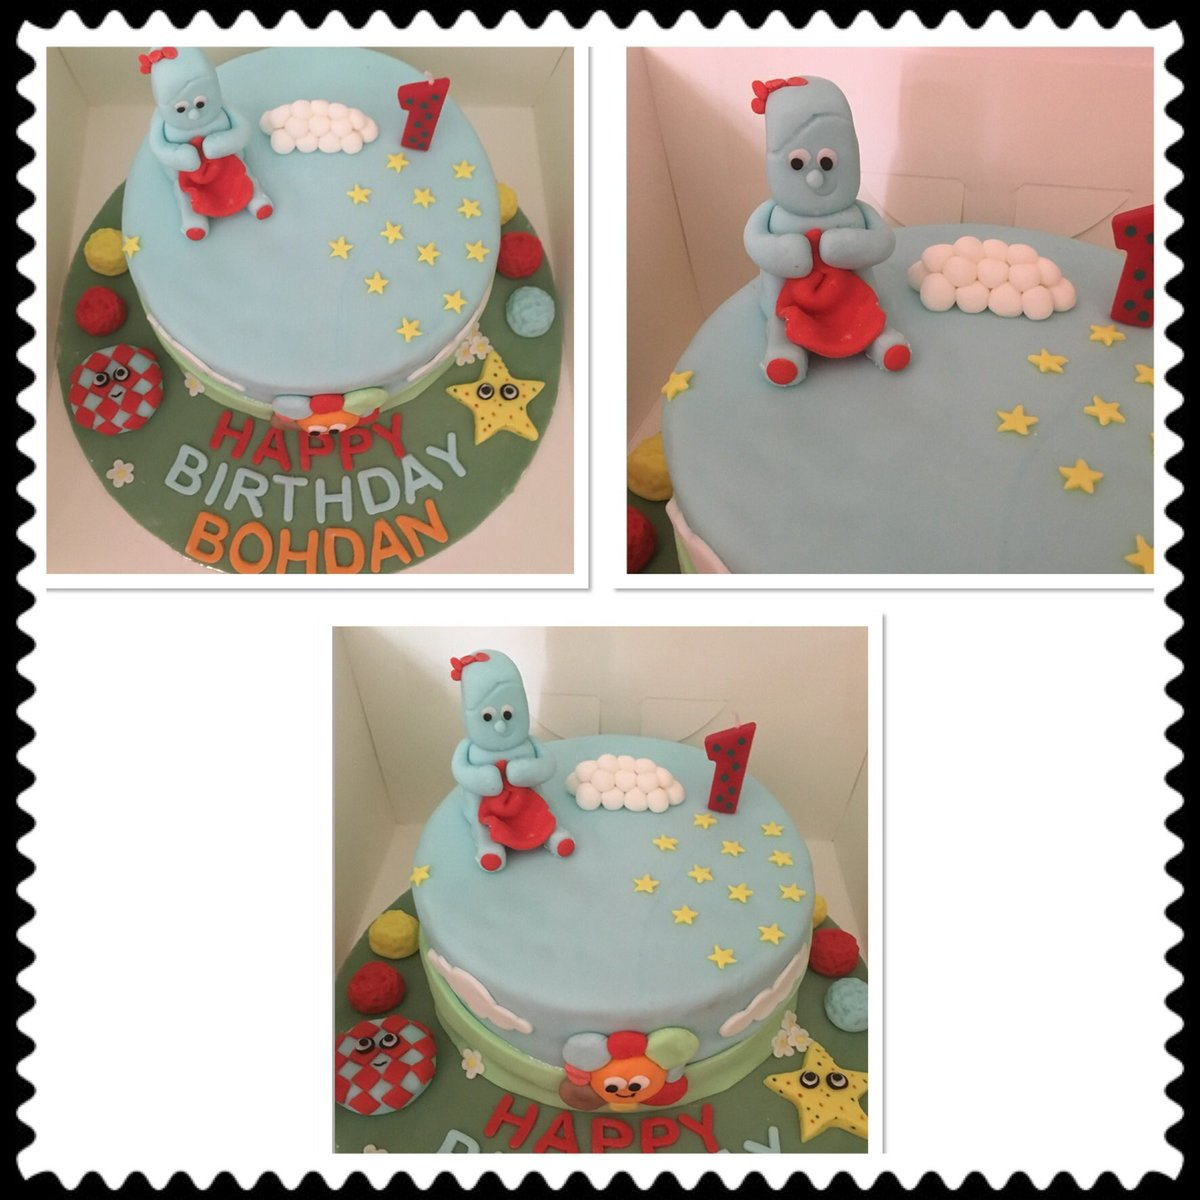 Birthday Cake 50th Woman